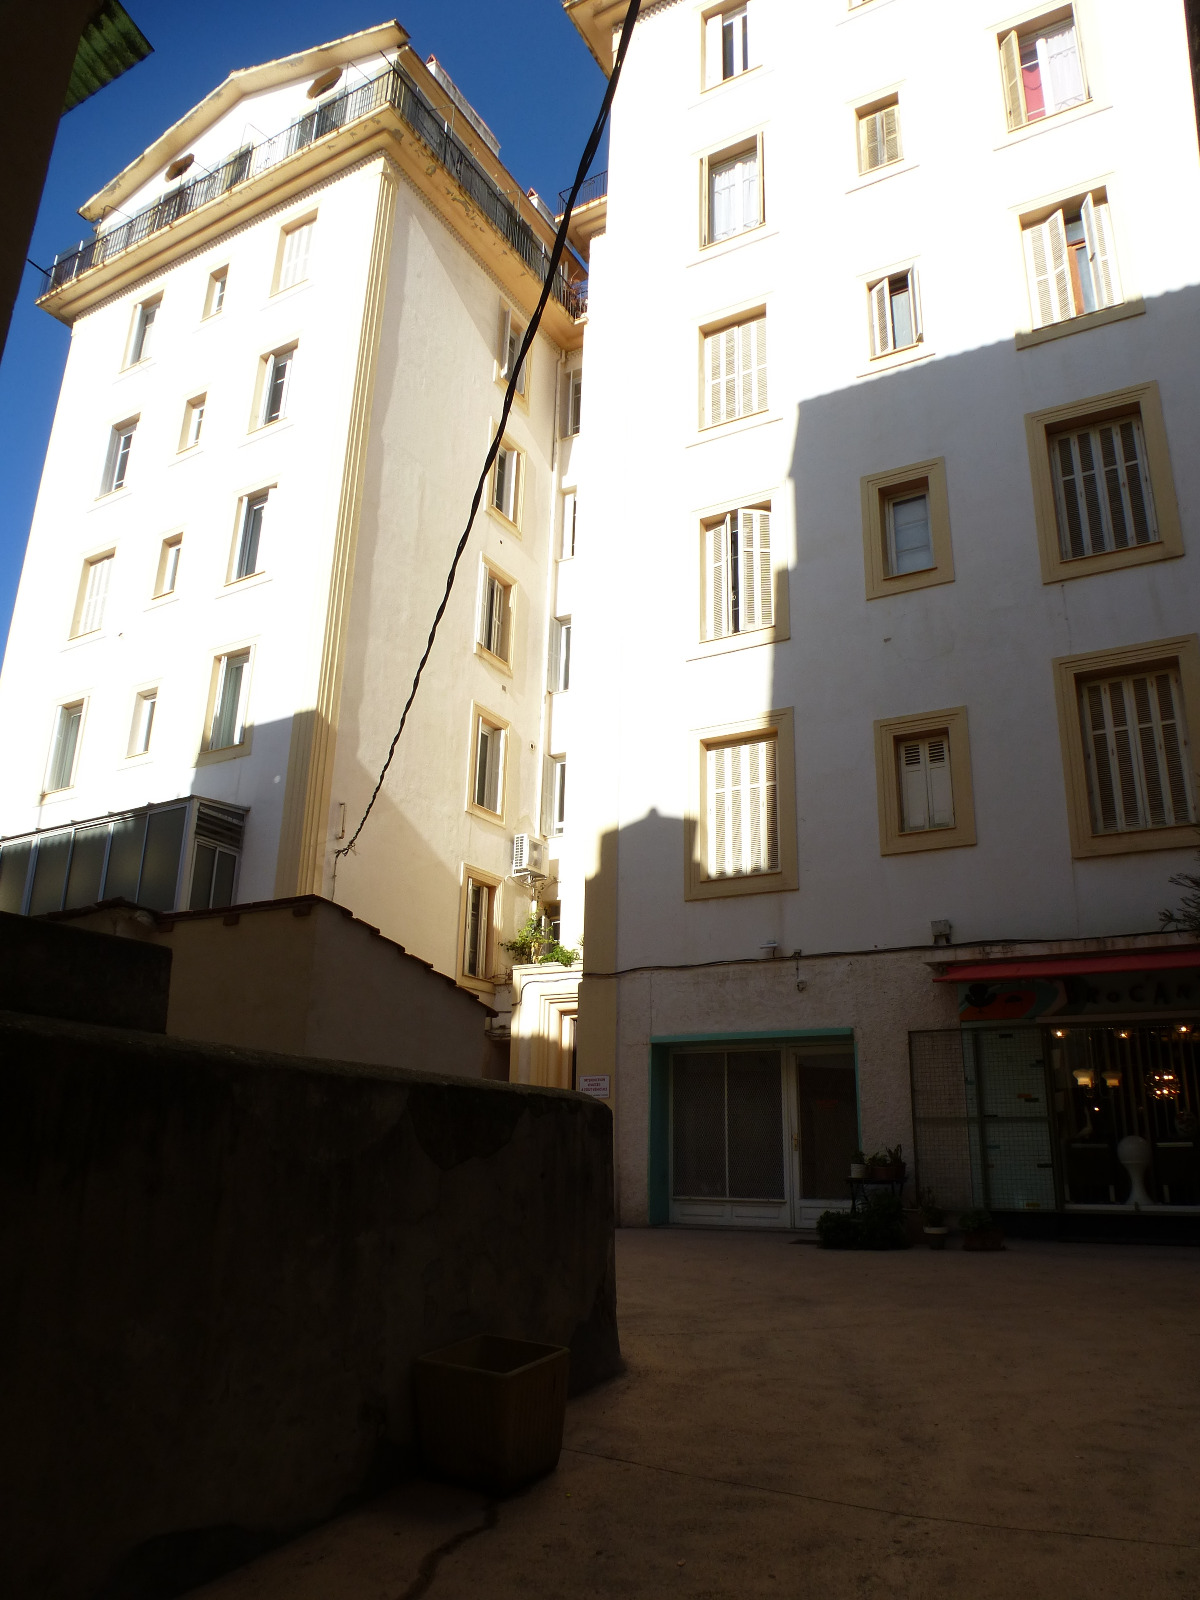 Achat villa/appartement Ajaccio, maison Corse du Sud